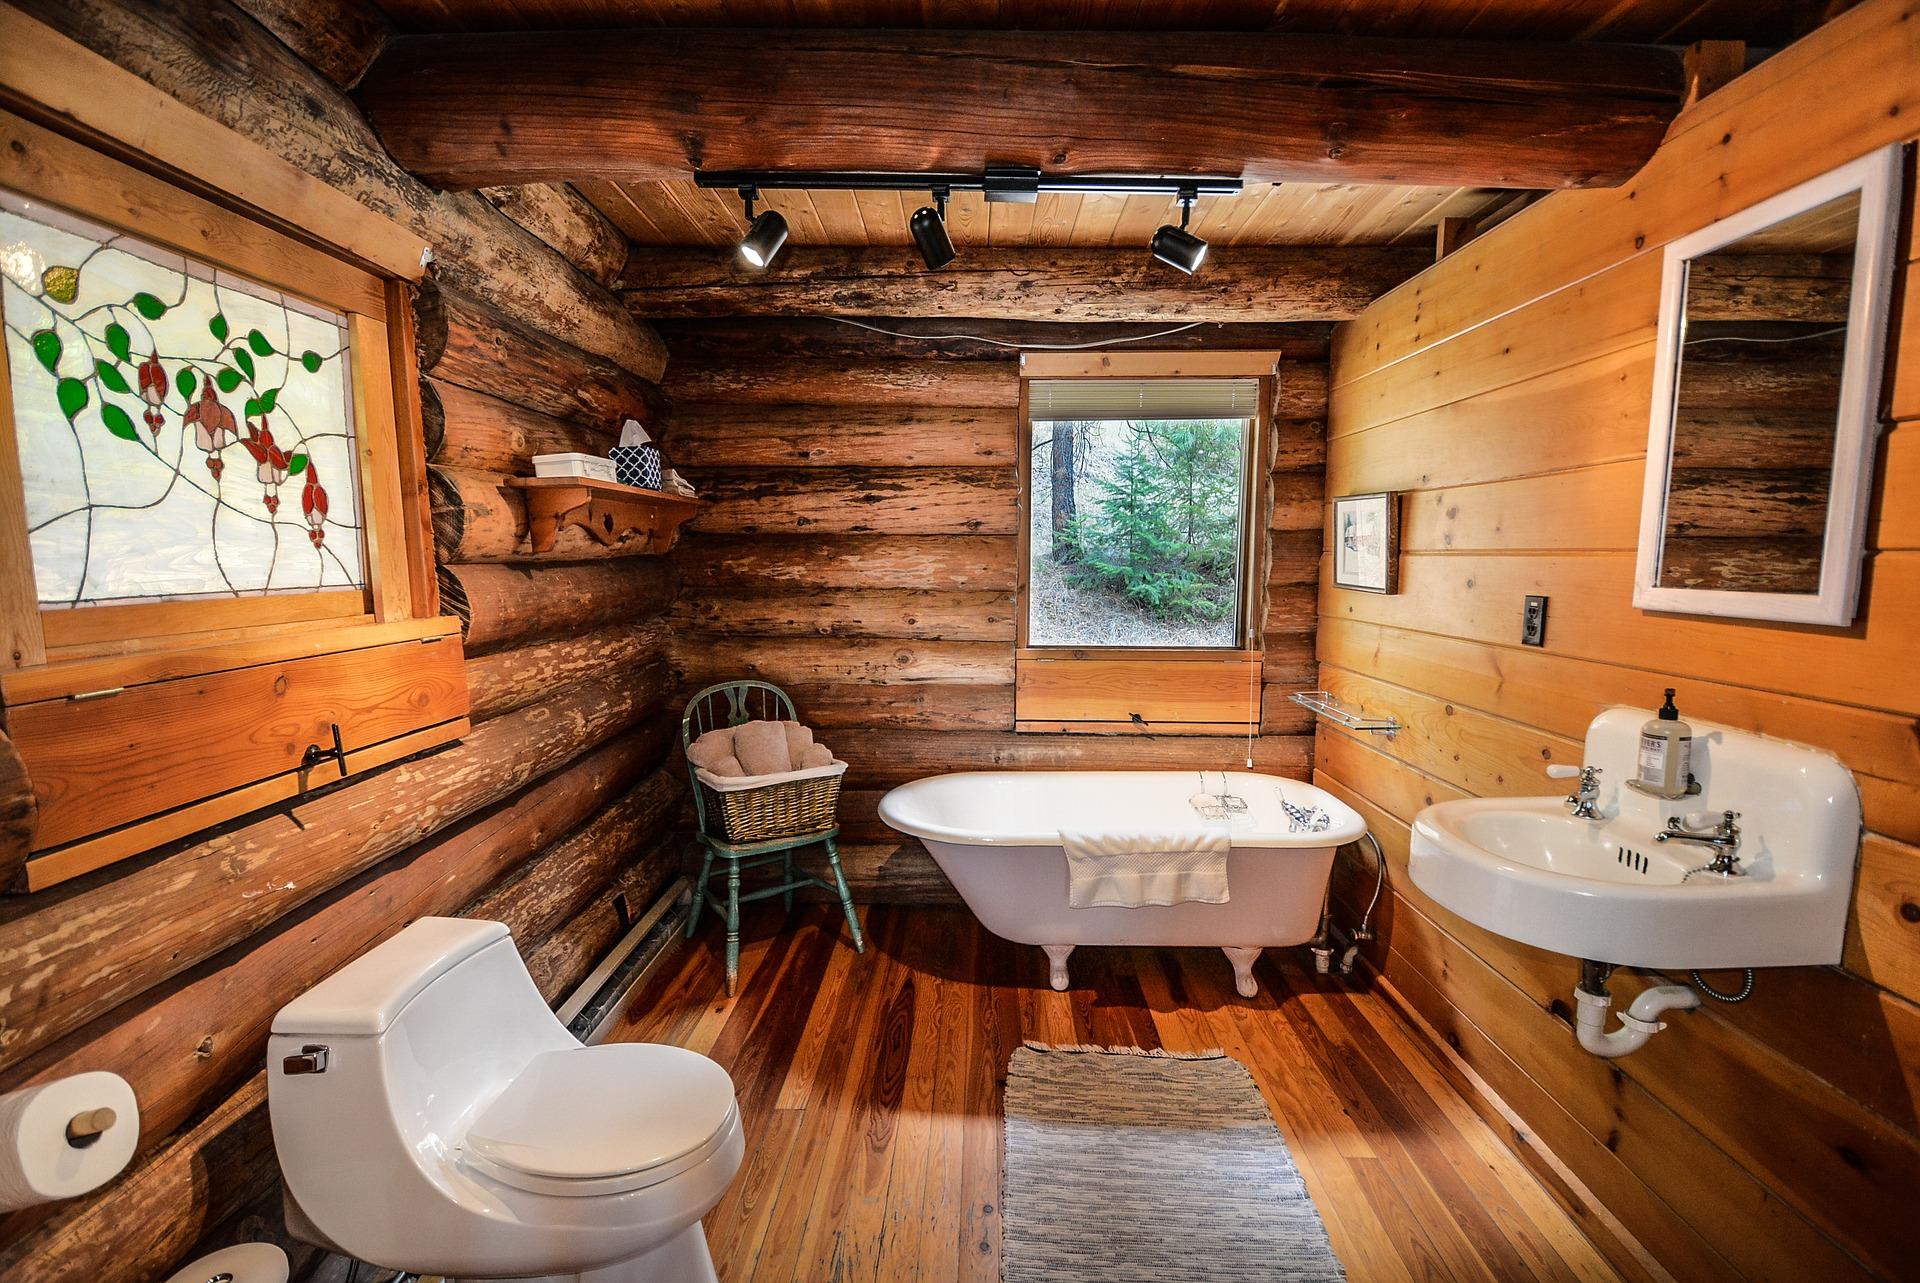 Rustic bathroom in a log cabin